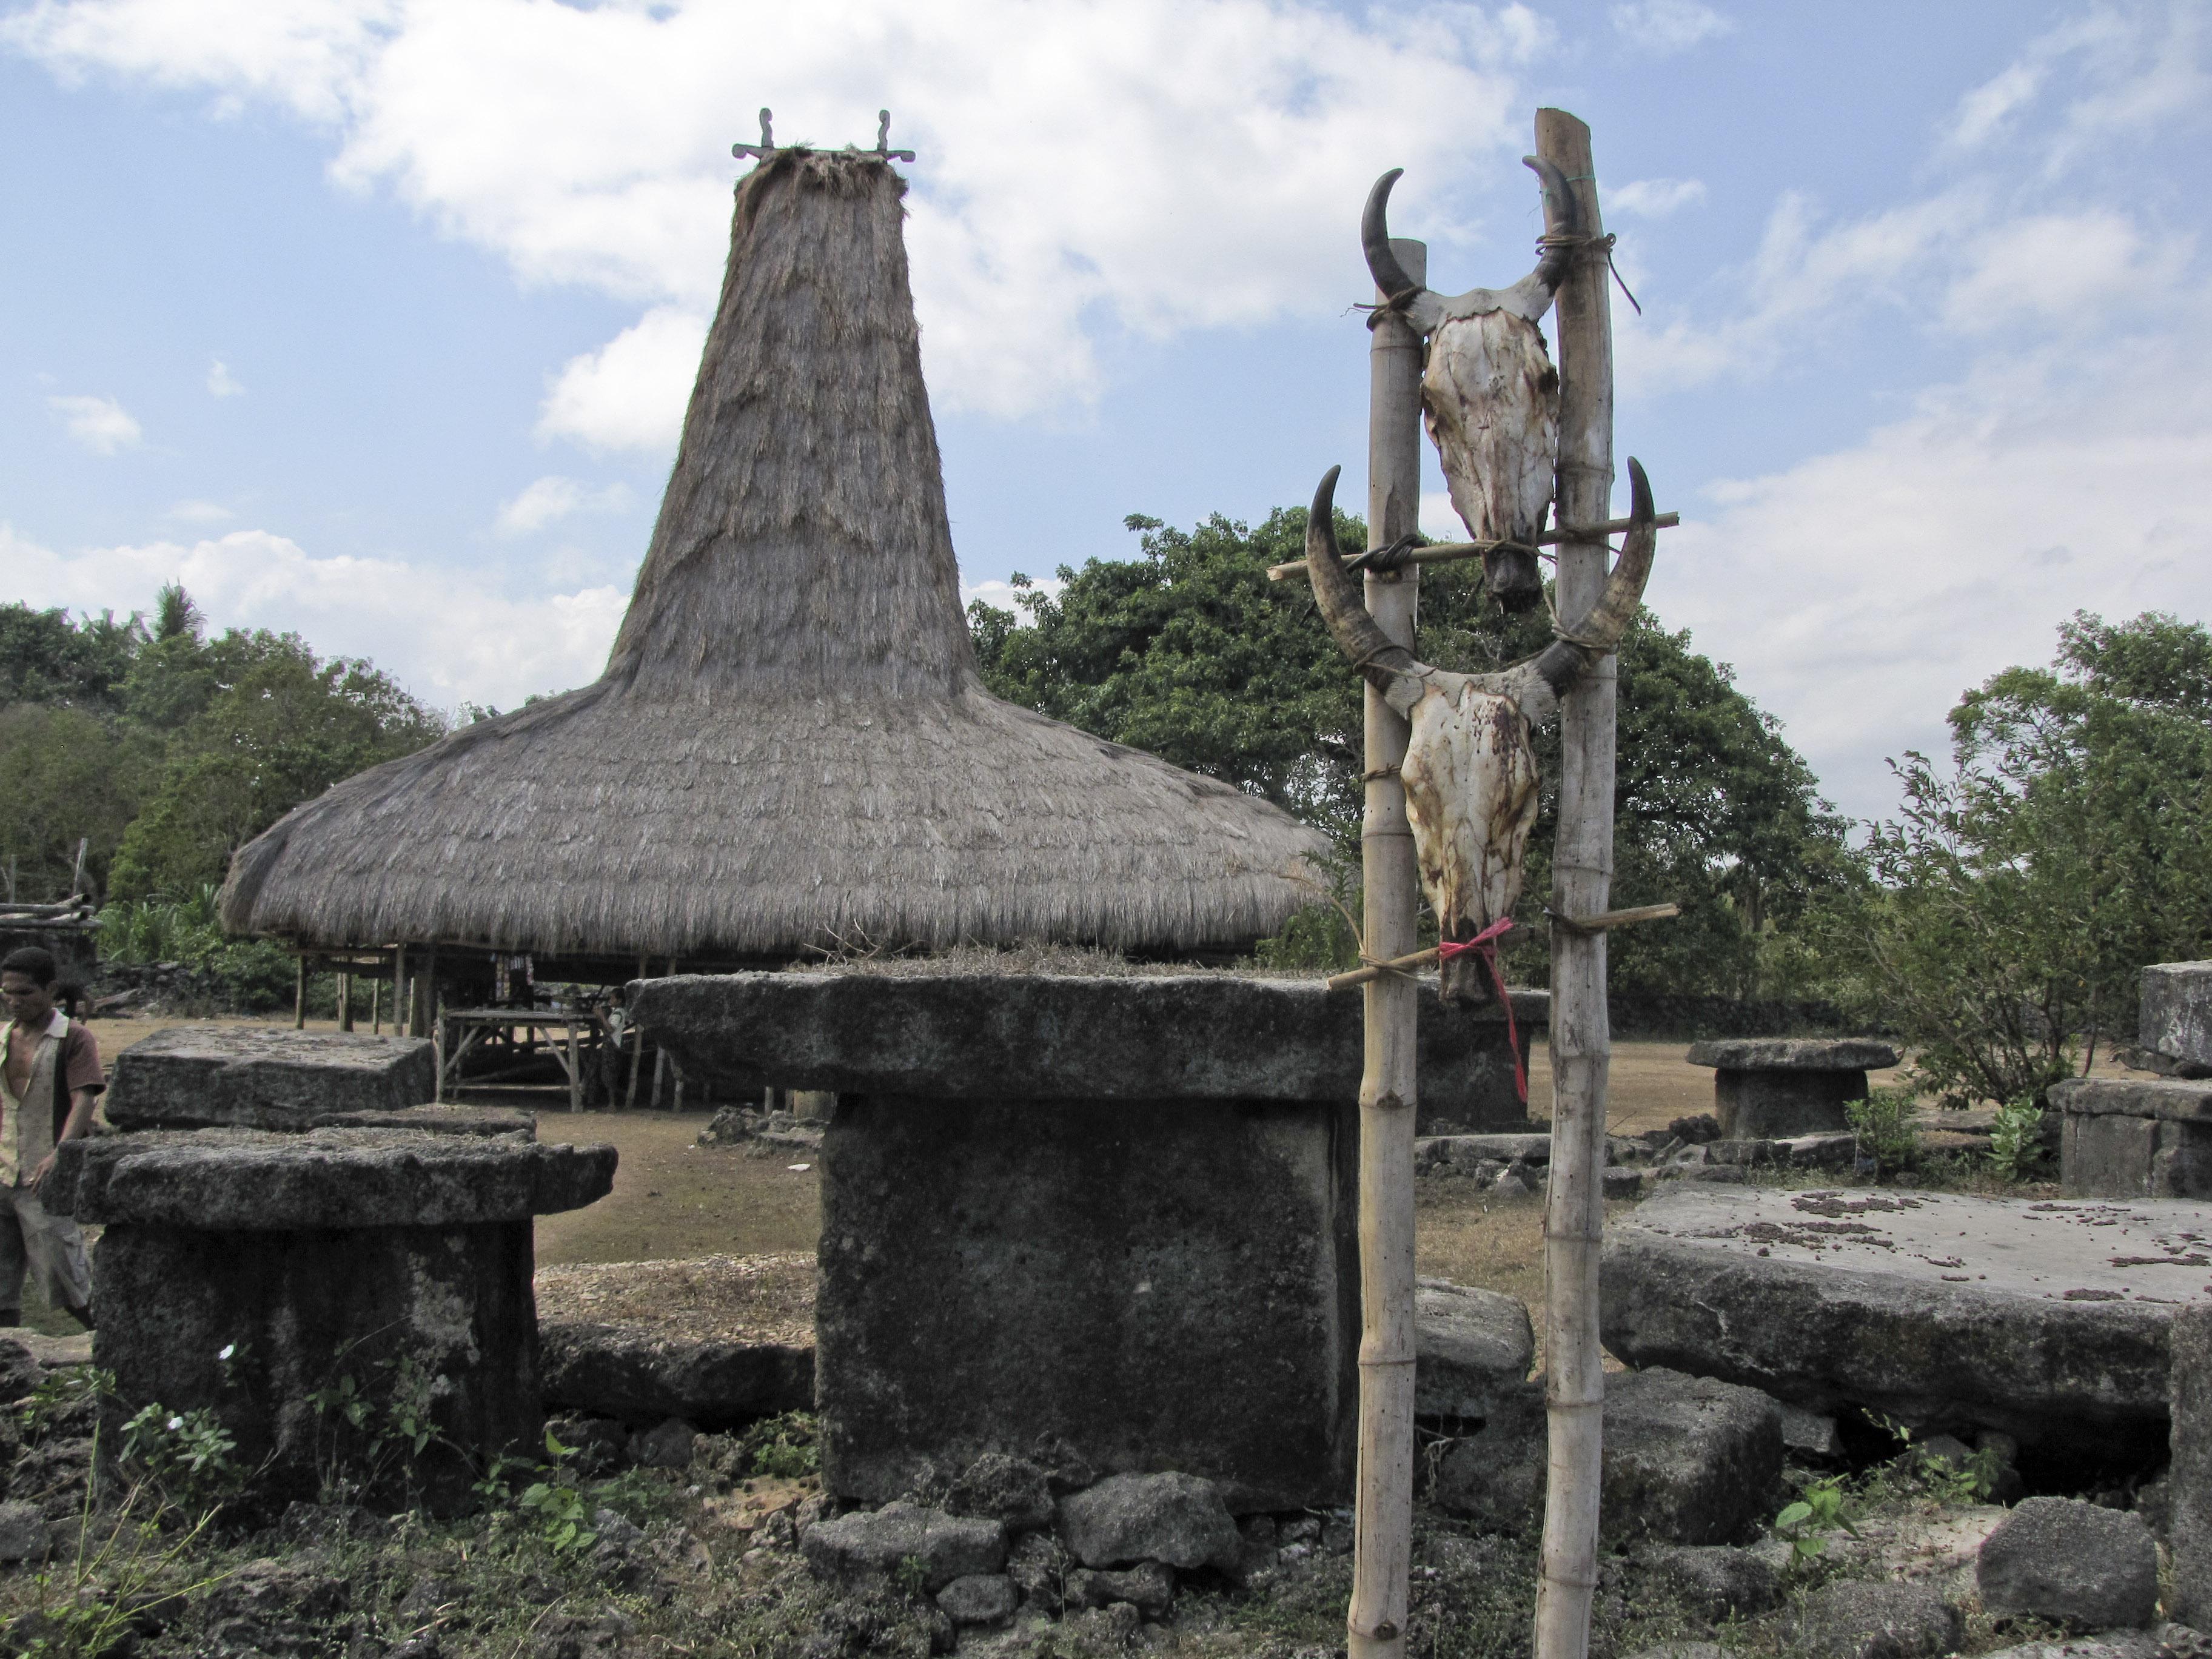 Rumah adat Sumba   Google Image/Wikipedia